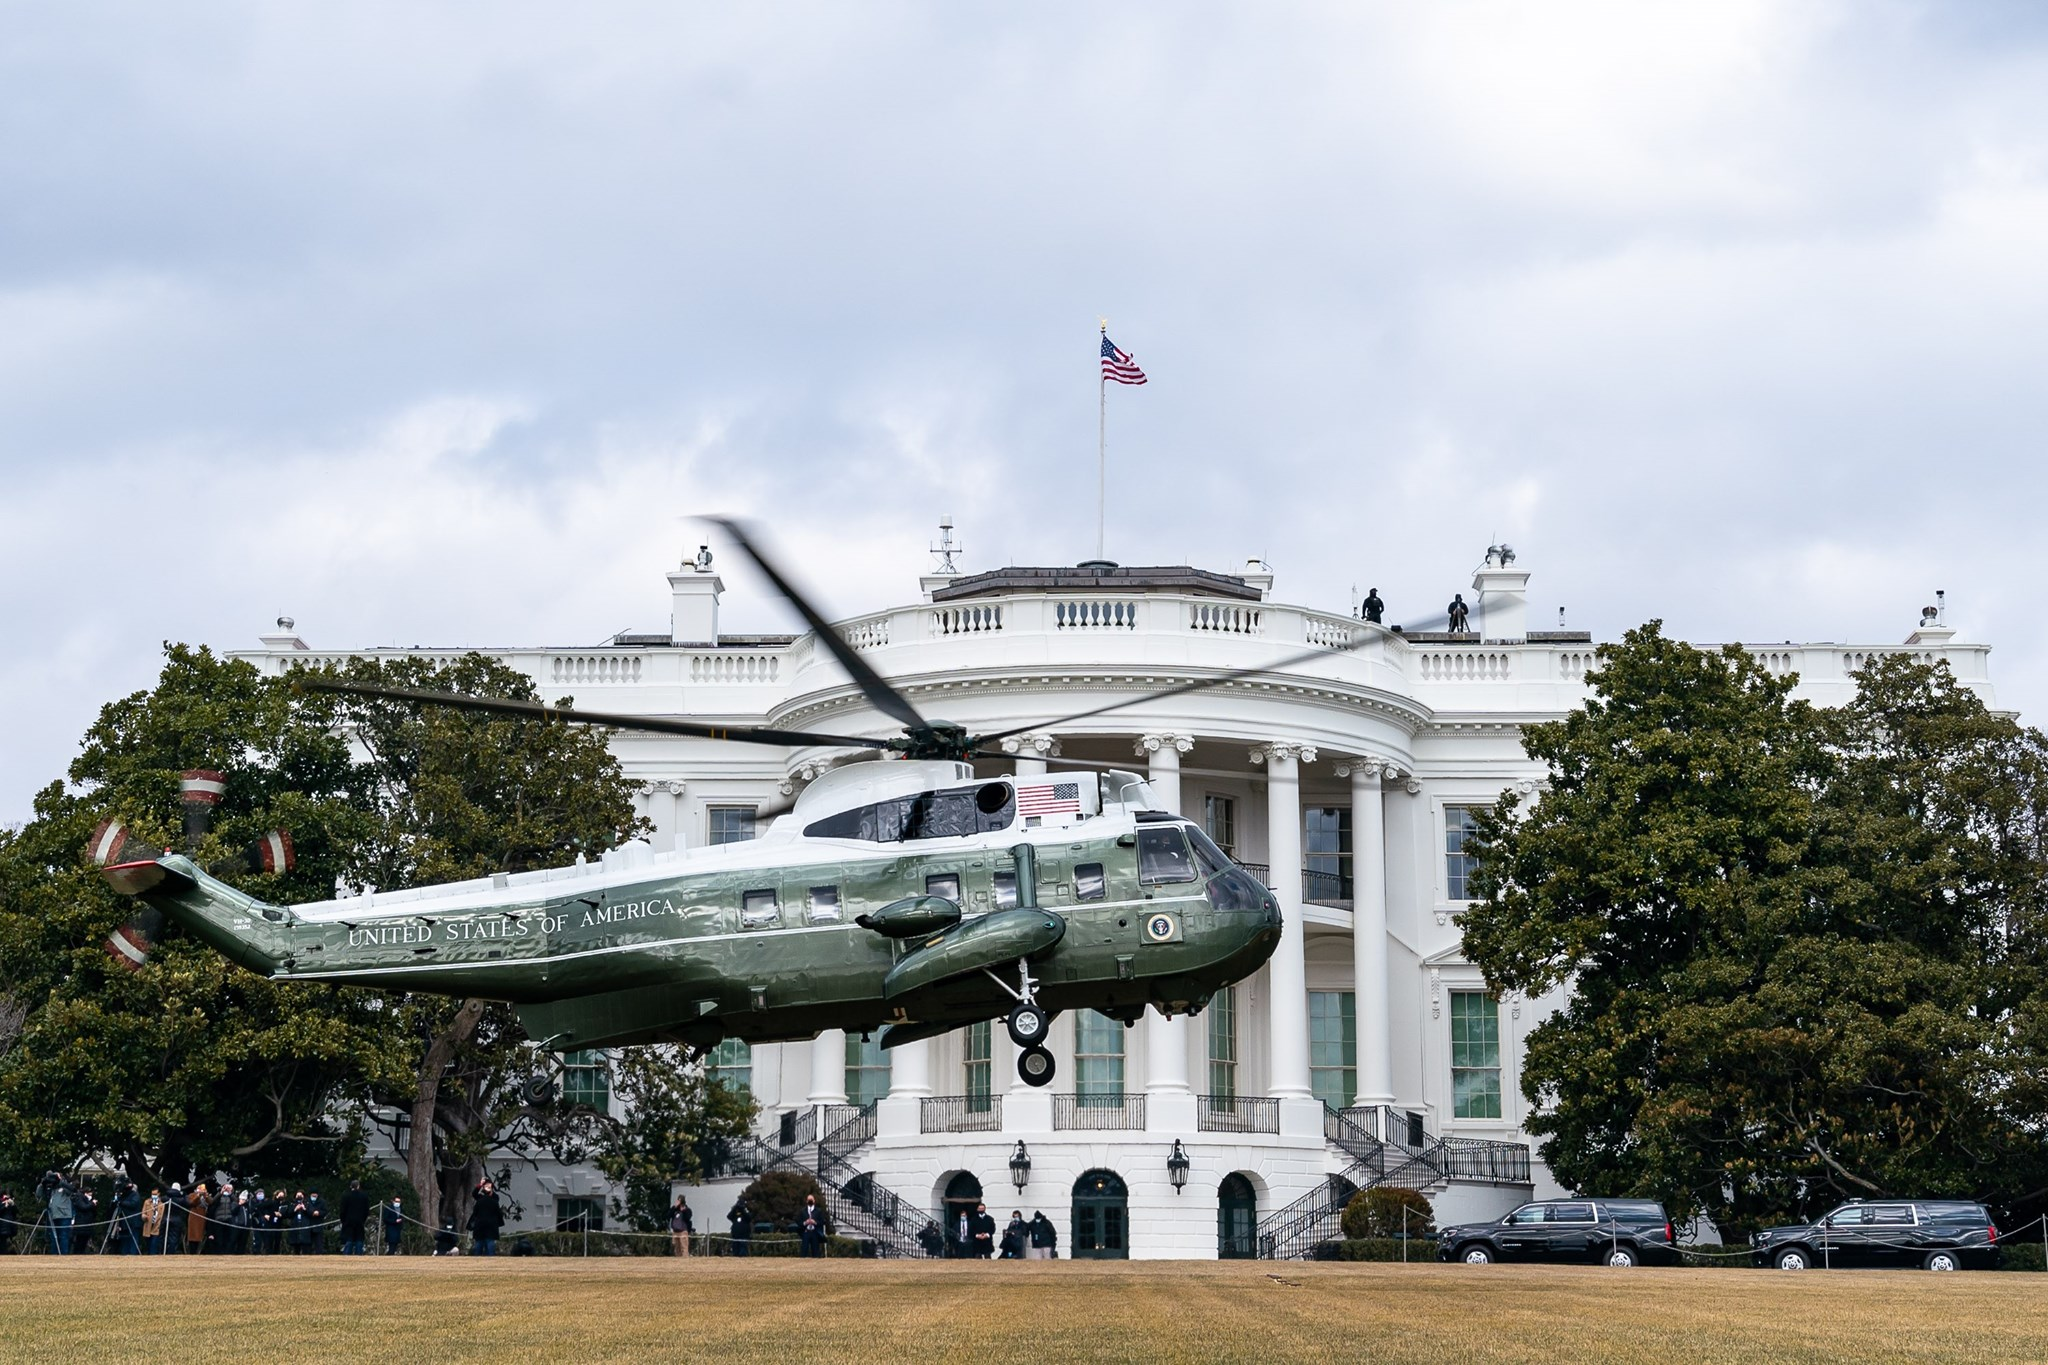 L'helicòpter presidencial aterra a la Casa Blanca/The White House Press